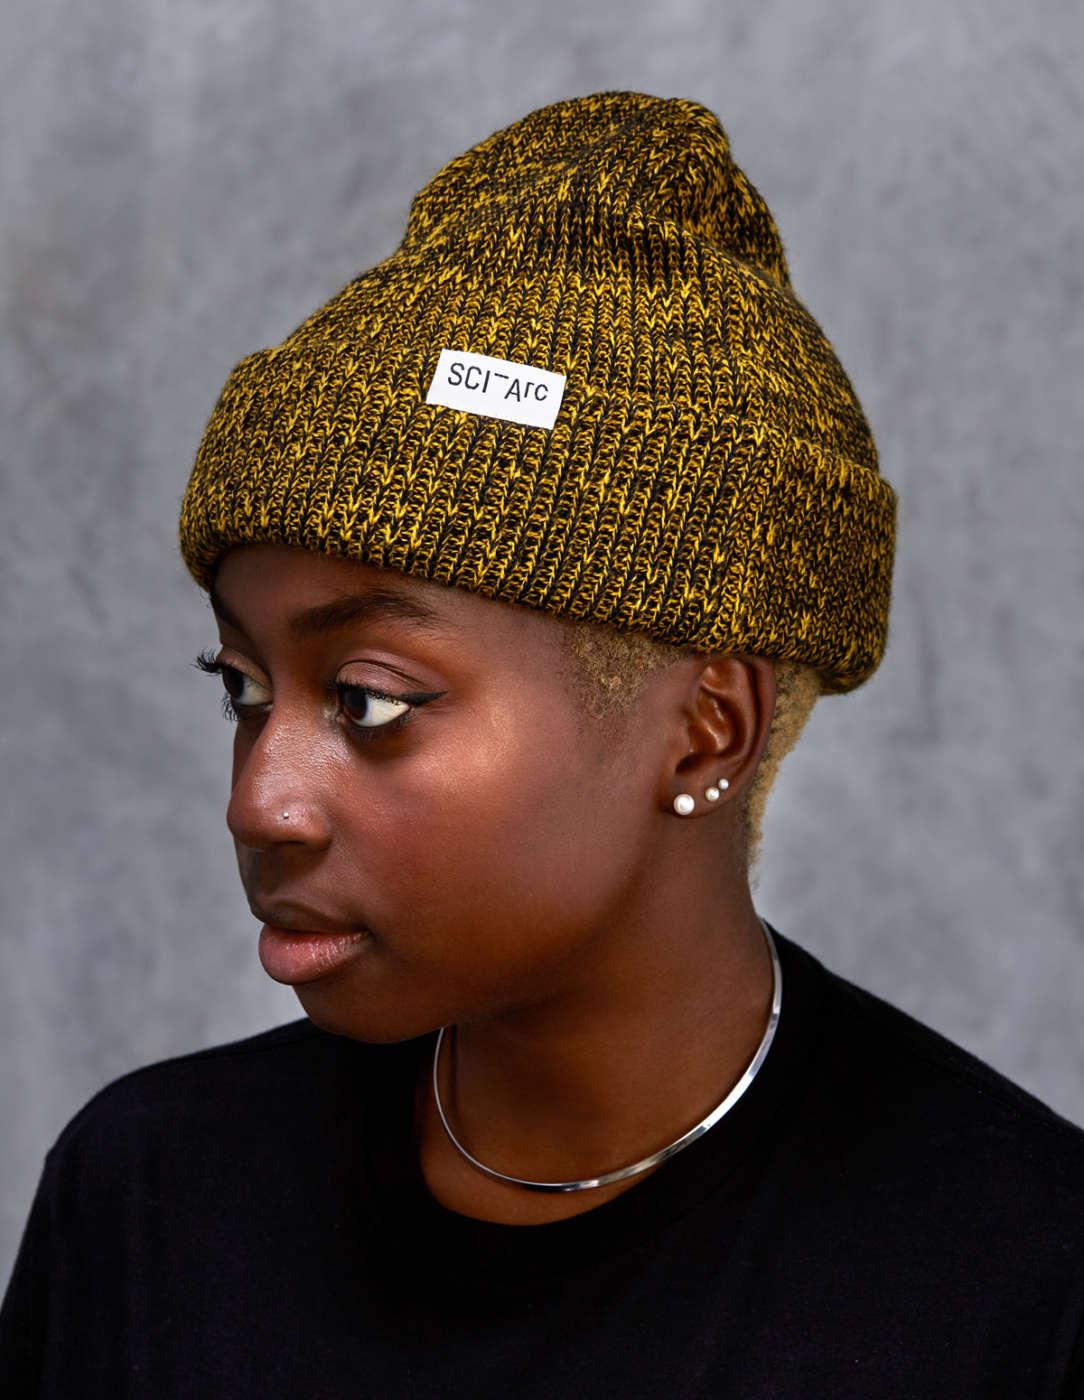 yellow knit sciarc logo beanie on person